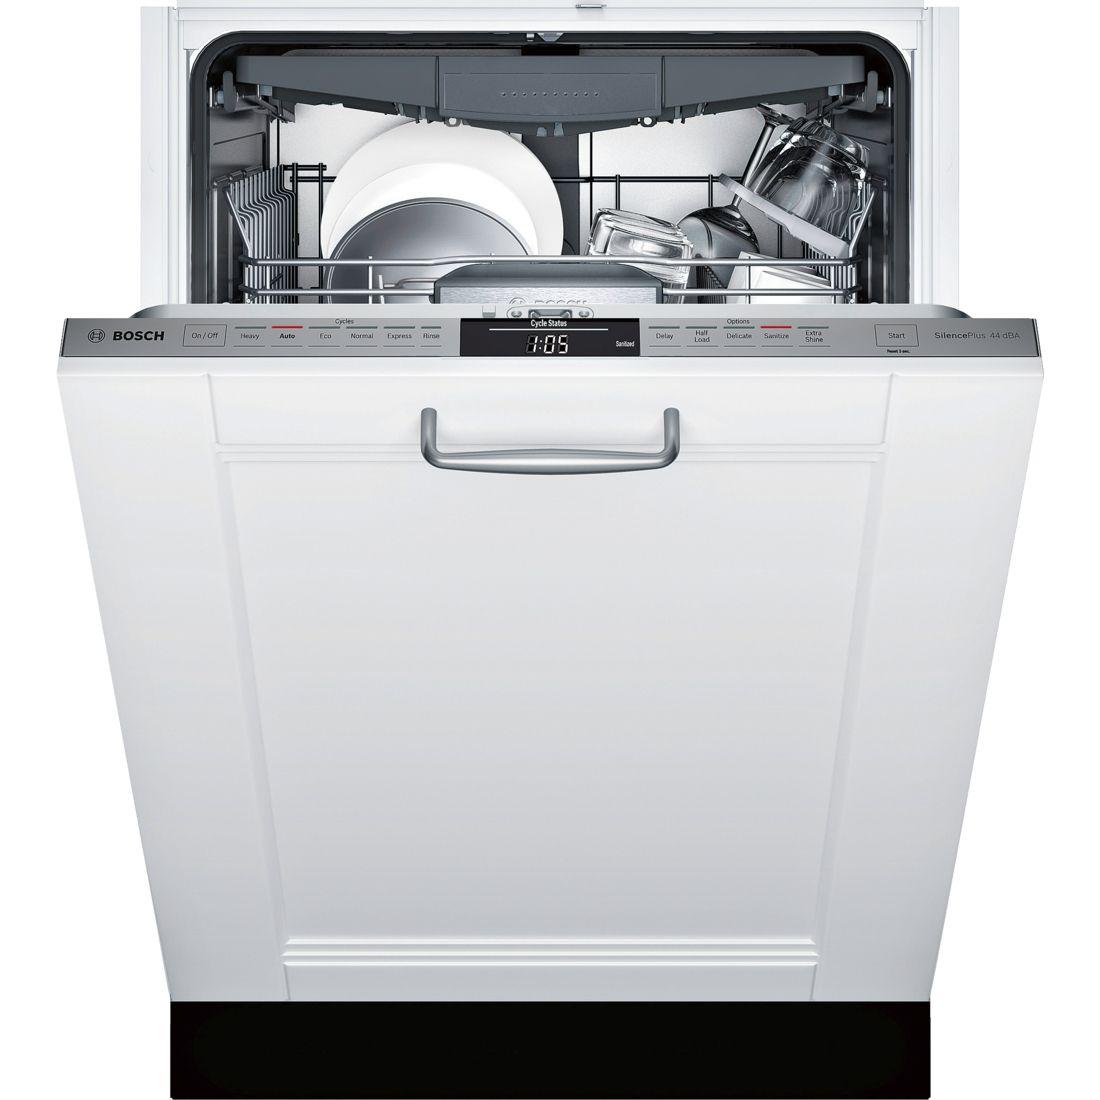 Kitchen Appliances Built in dishwasher, Integrated